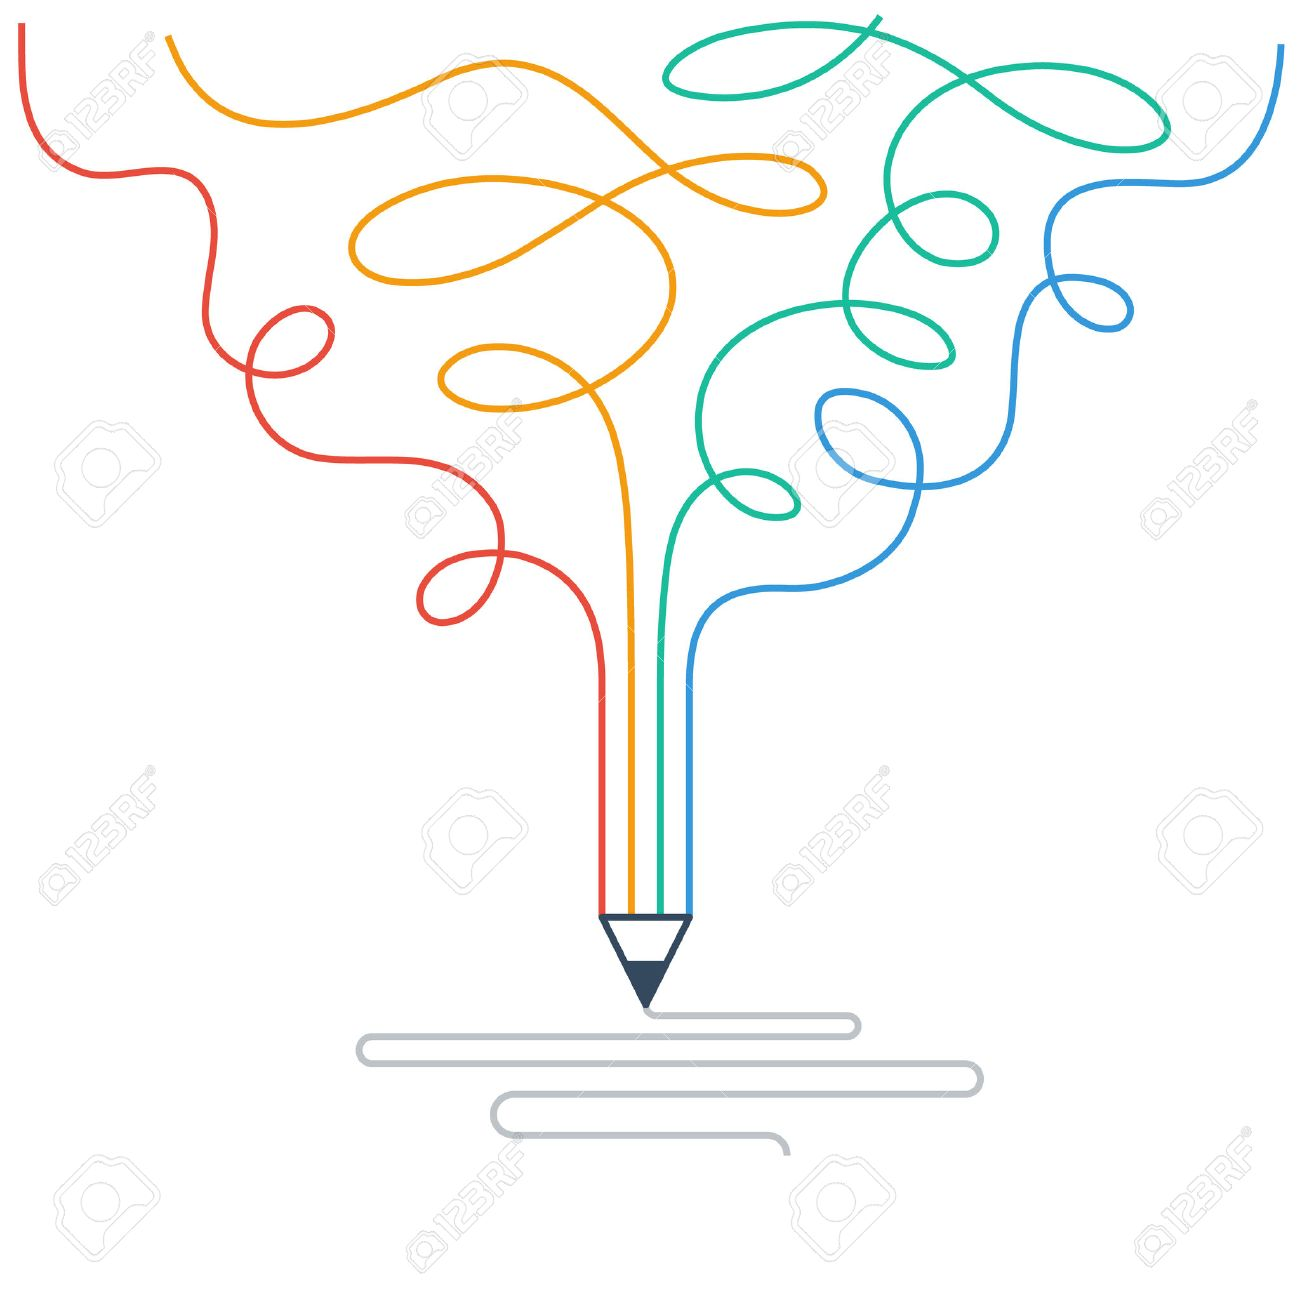 Creative writing. Storytelling. Graphic design studio symbol - 53250493